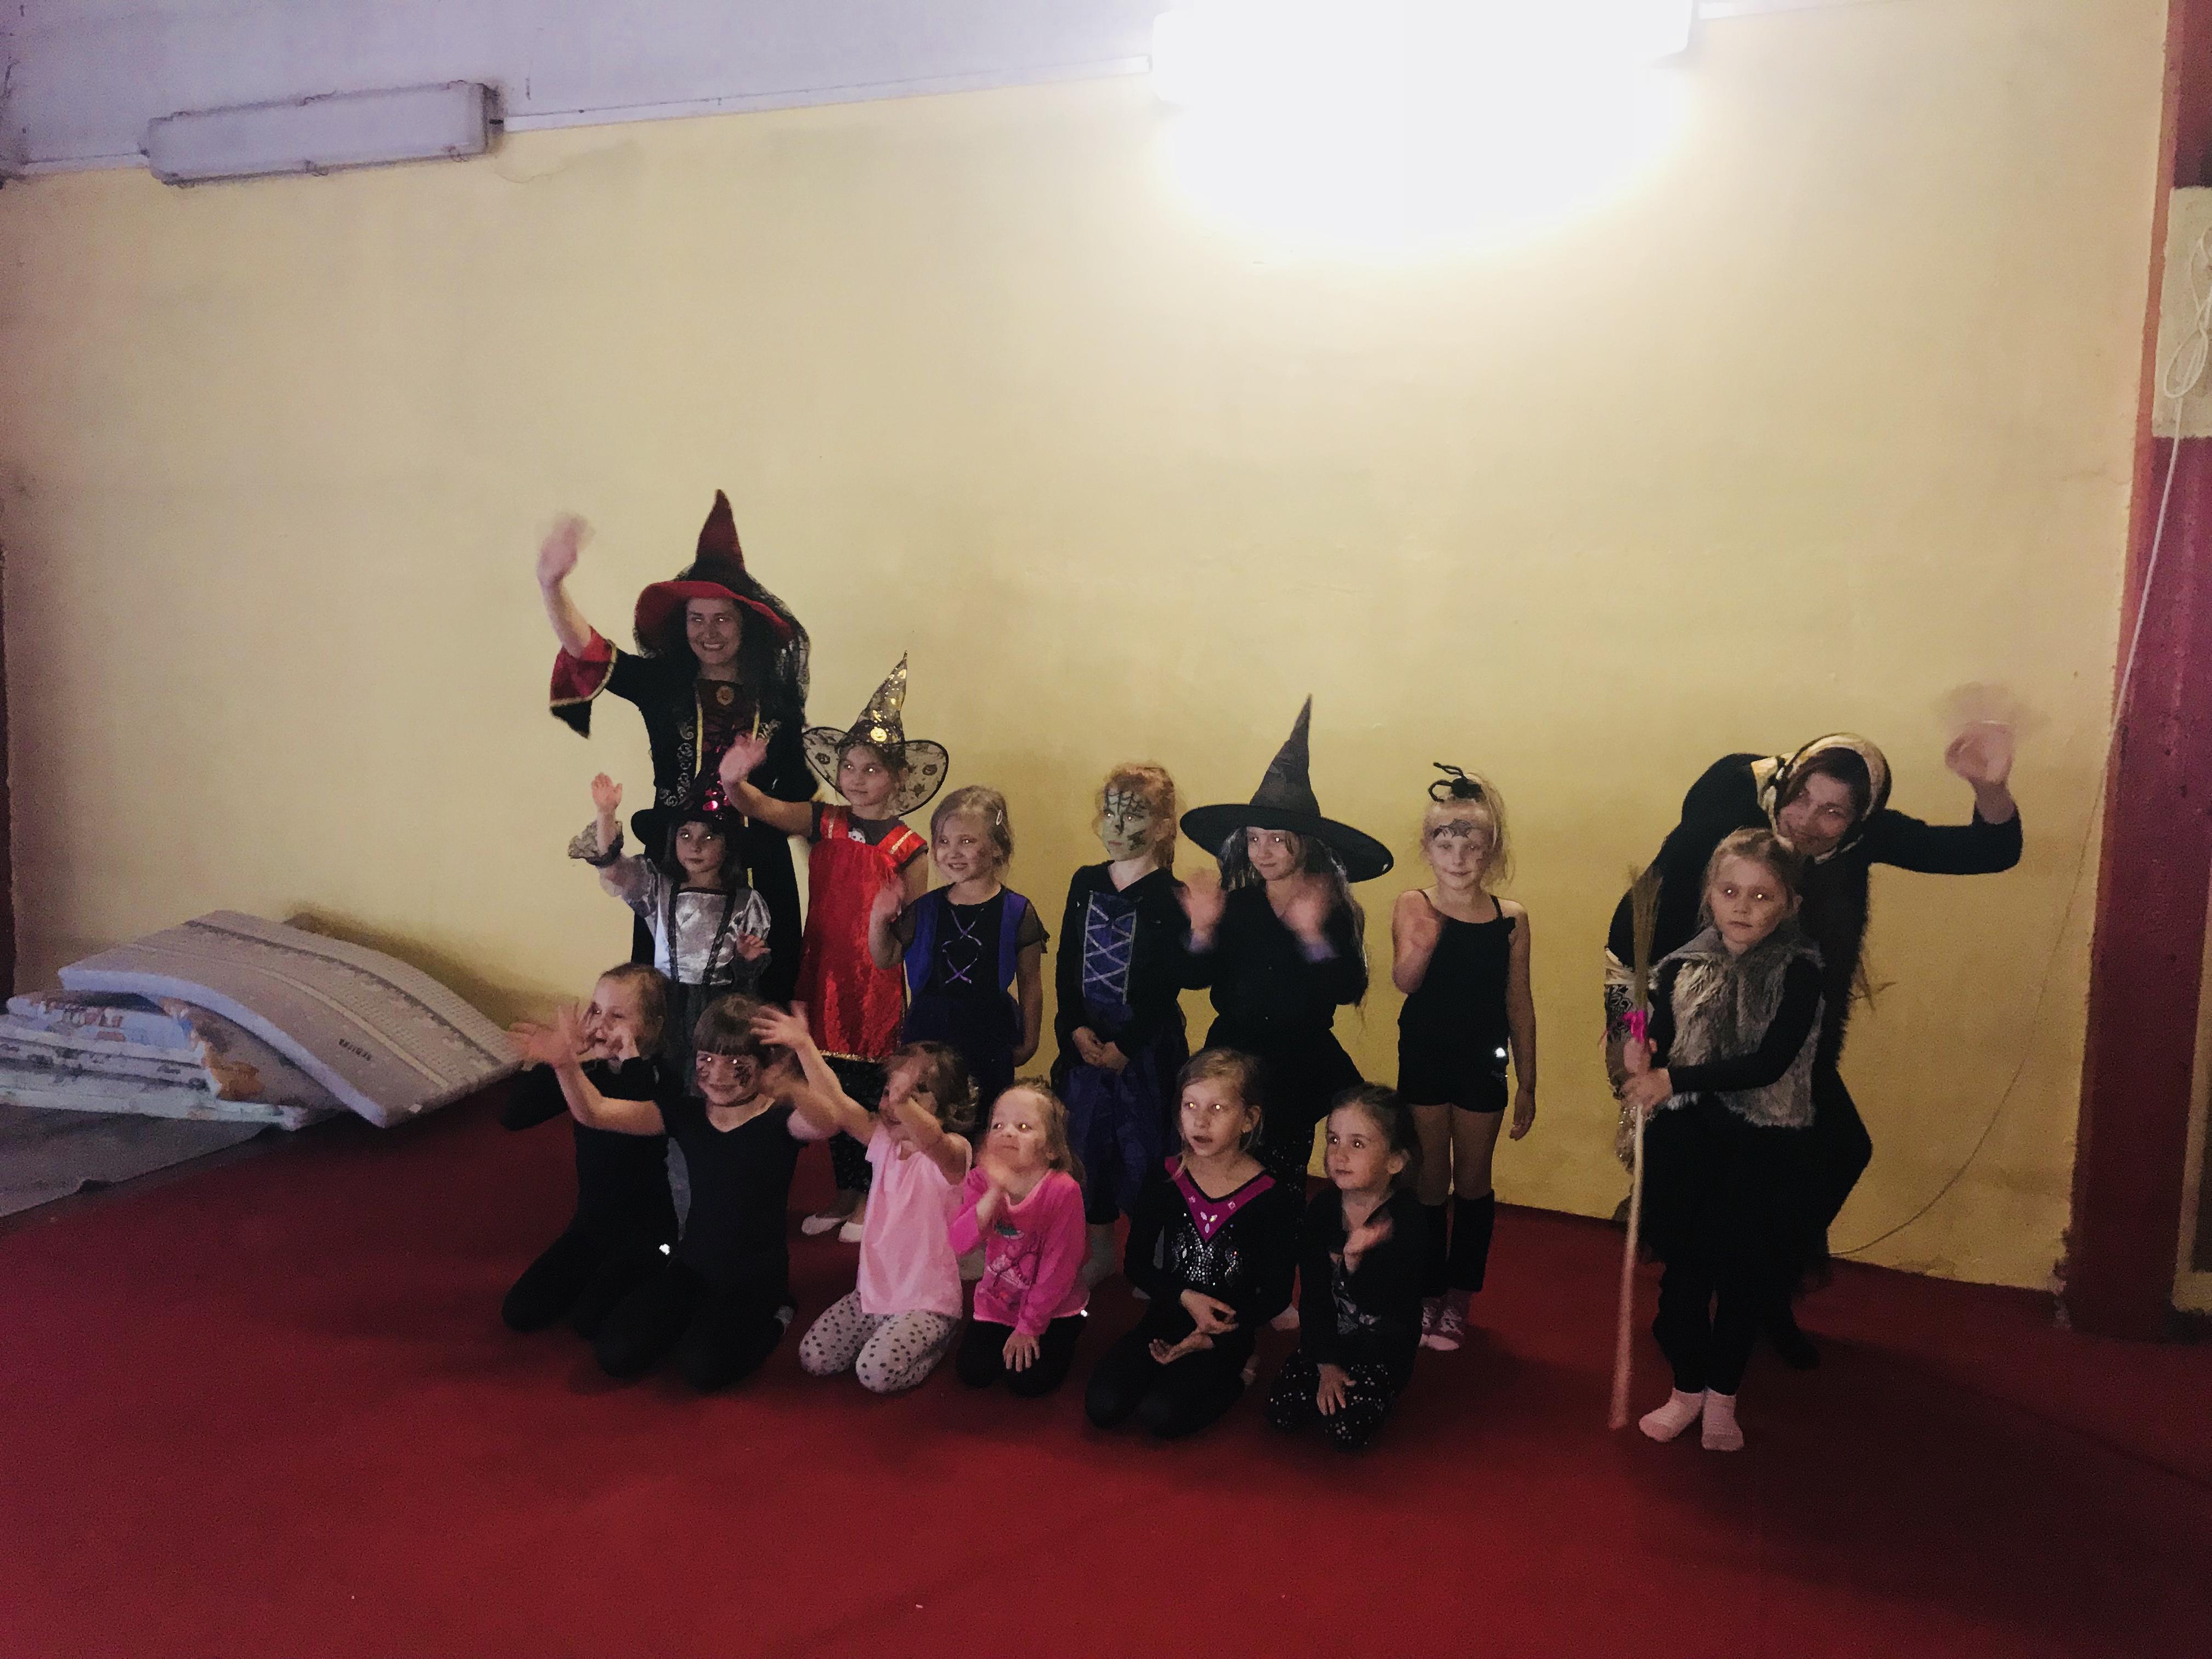 http://gymnastika-hk.cz//public/galerie/fotoalbum/2018_carodejnice/image6.jpeg